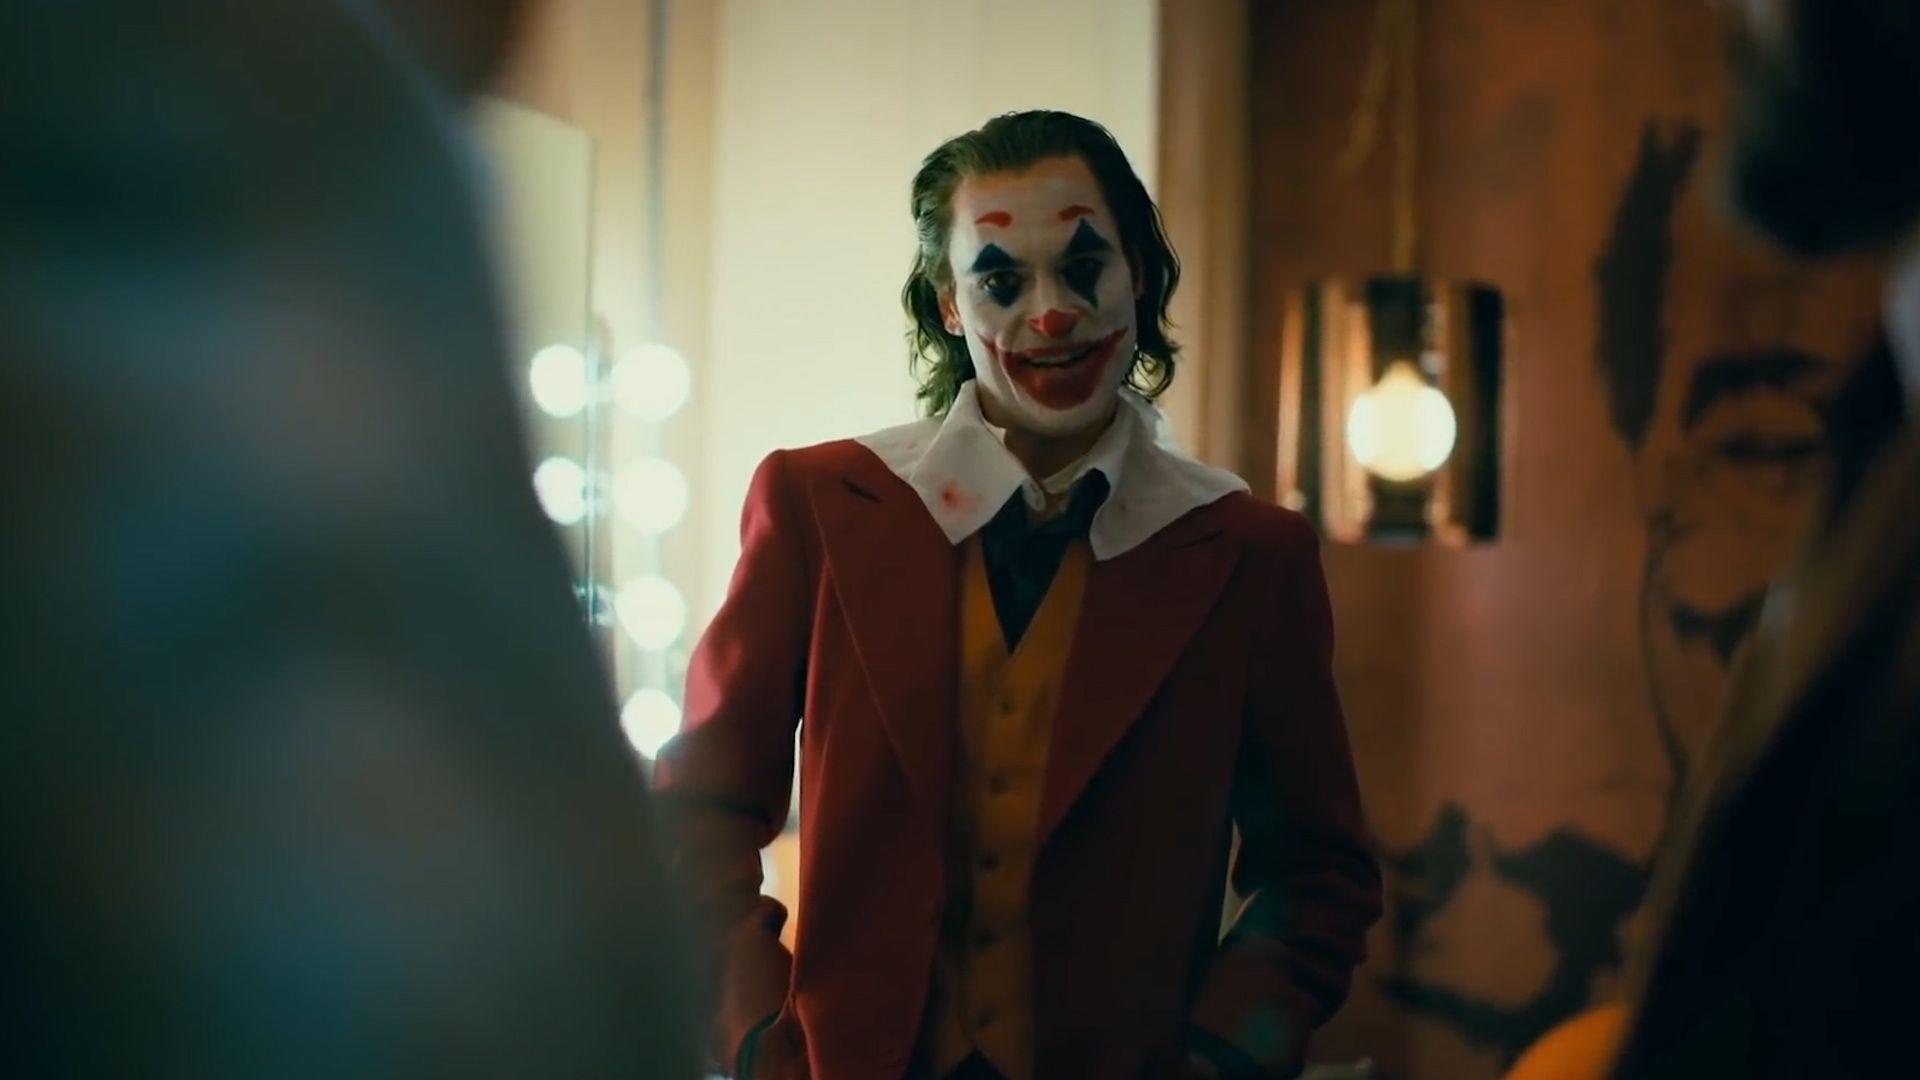 Mortal Kombat 11 Just Released the Joker DLC. I Am So Sick of the Joker.